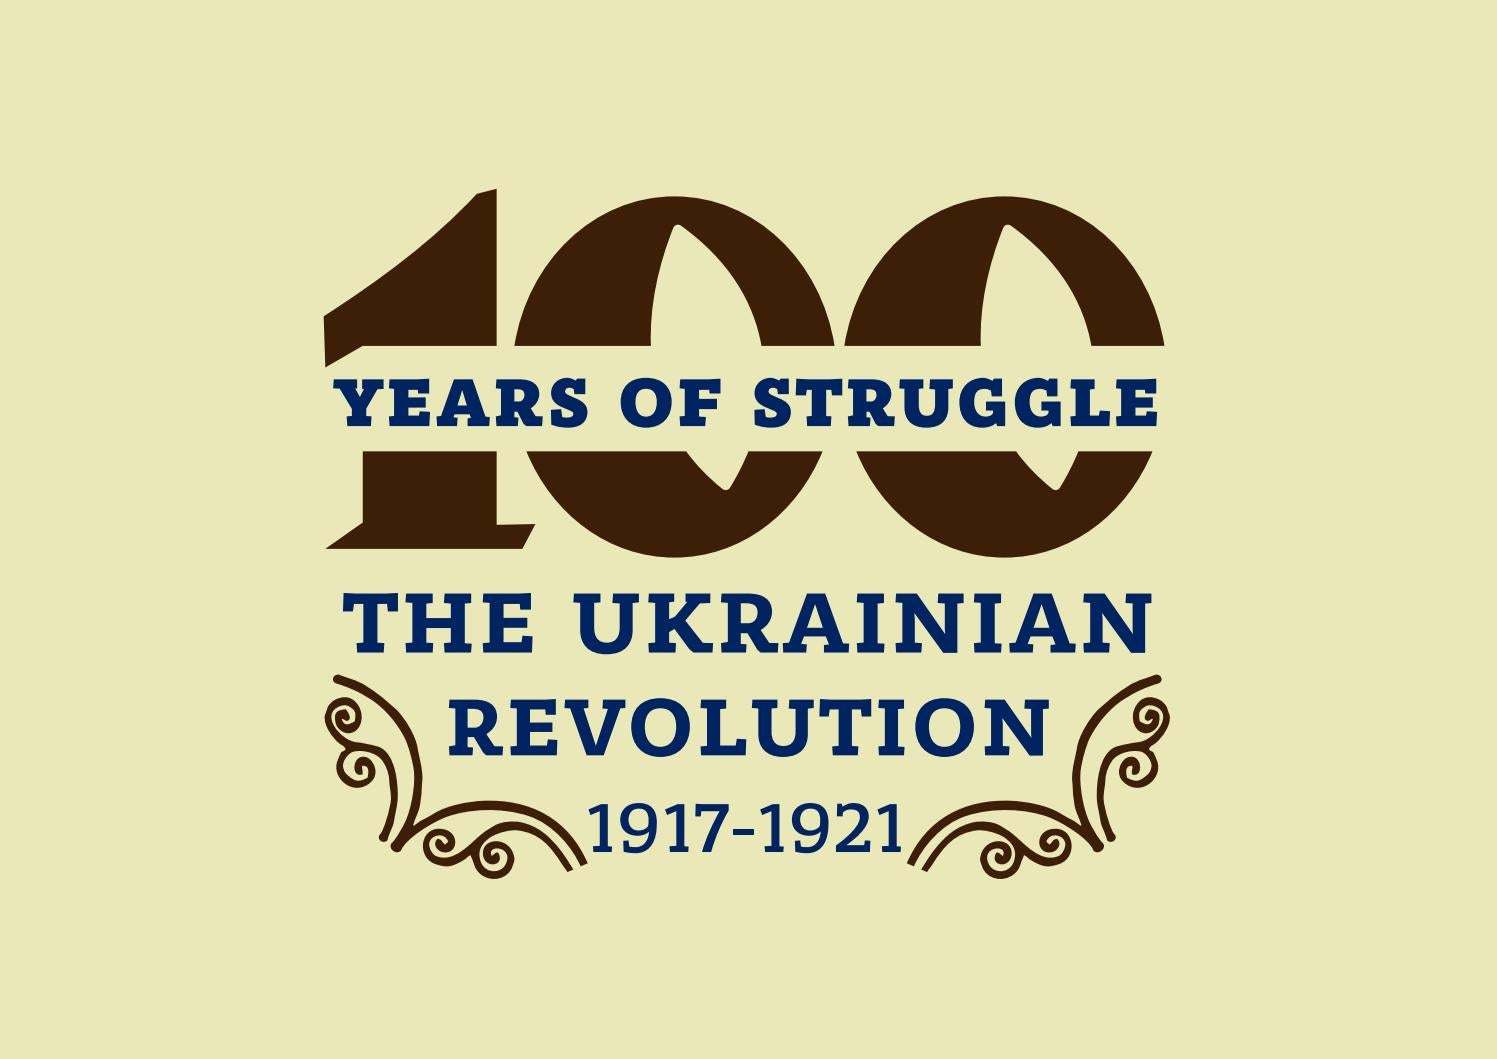 100 Years Of Struggle The Ukrainian Revolution 1917 1921 By